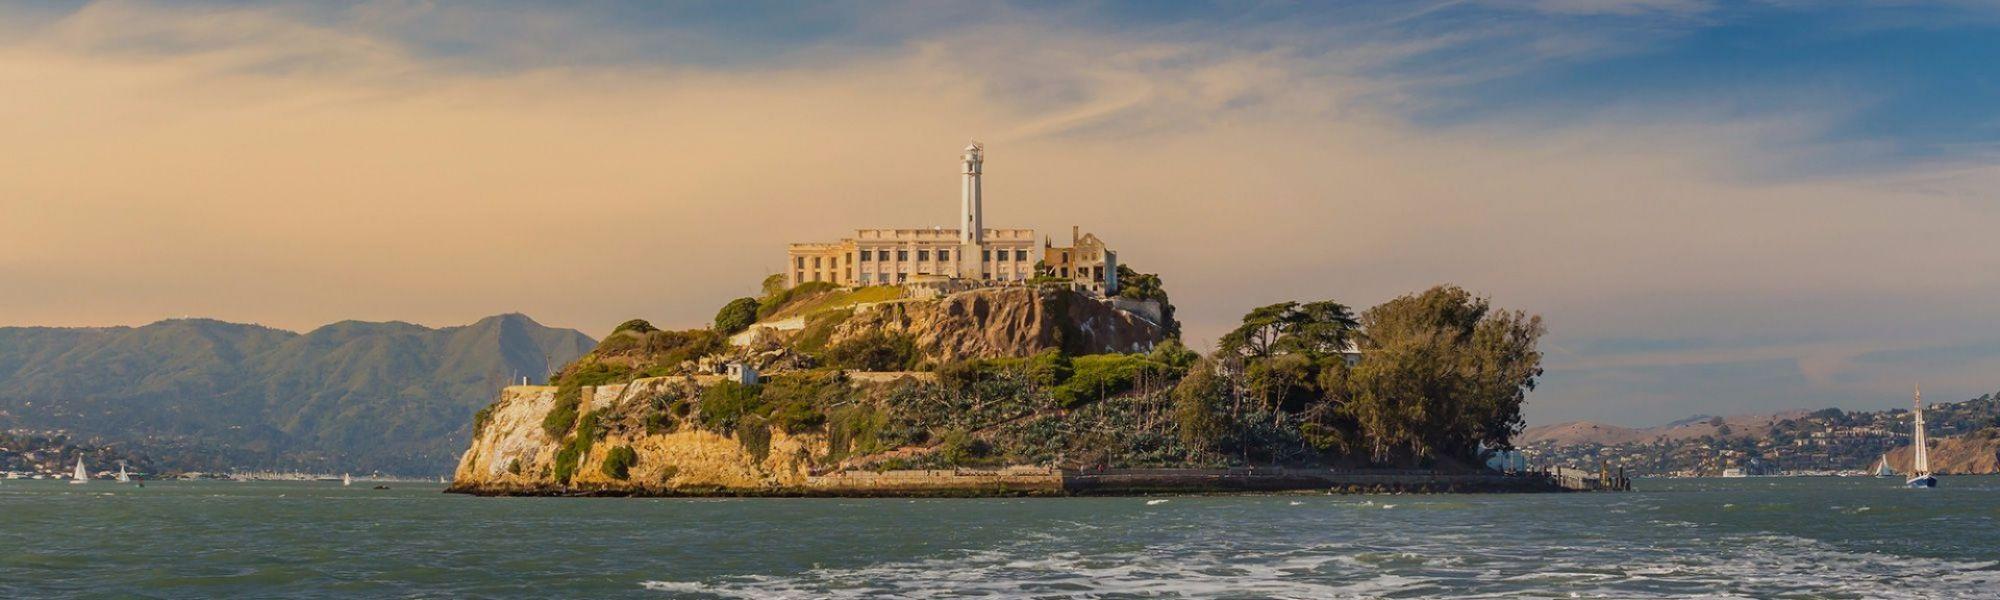 San Francisco Premium Ticket + Alcatraz (Peak)